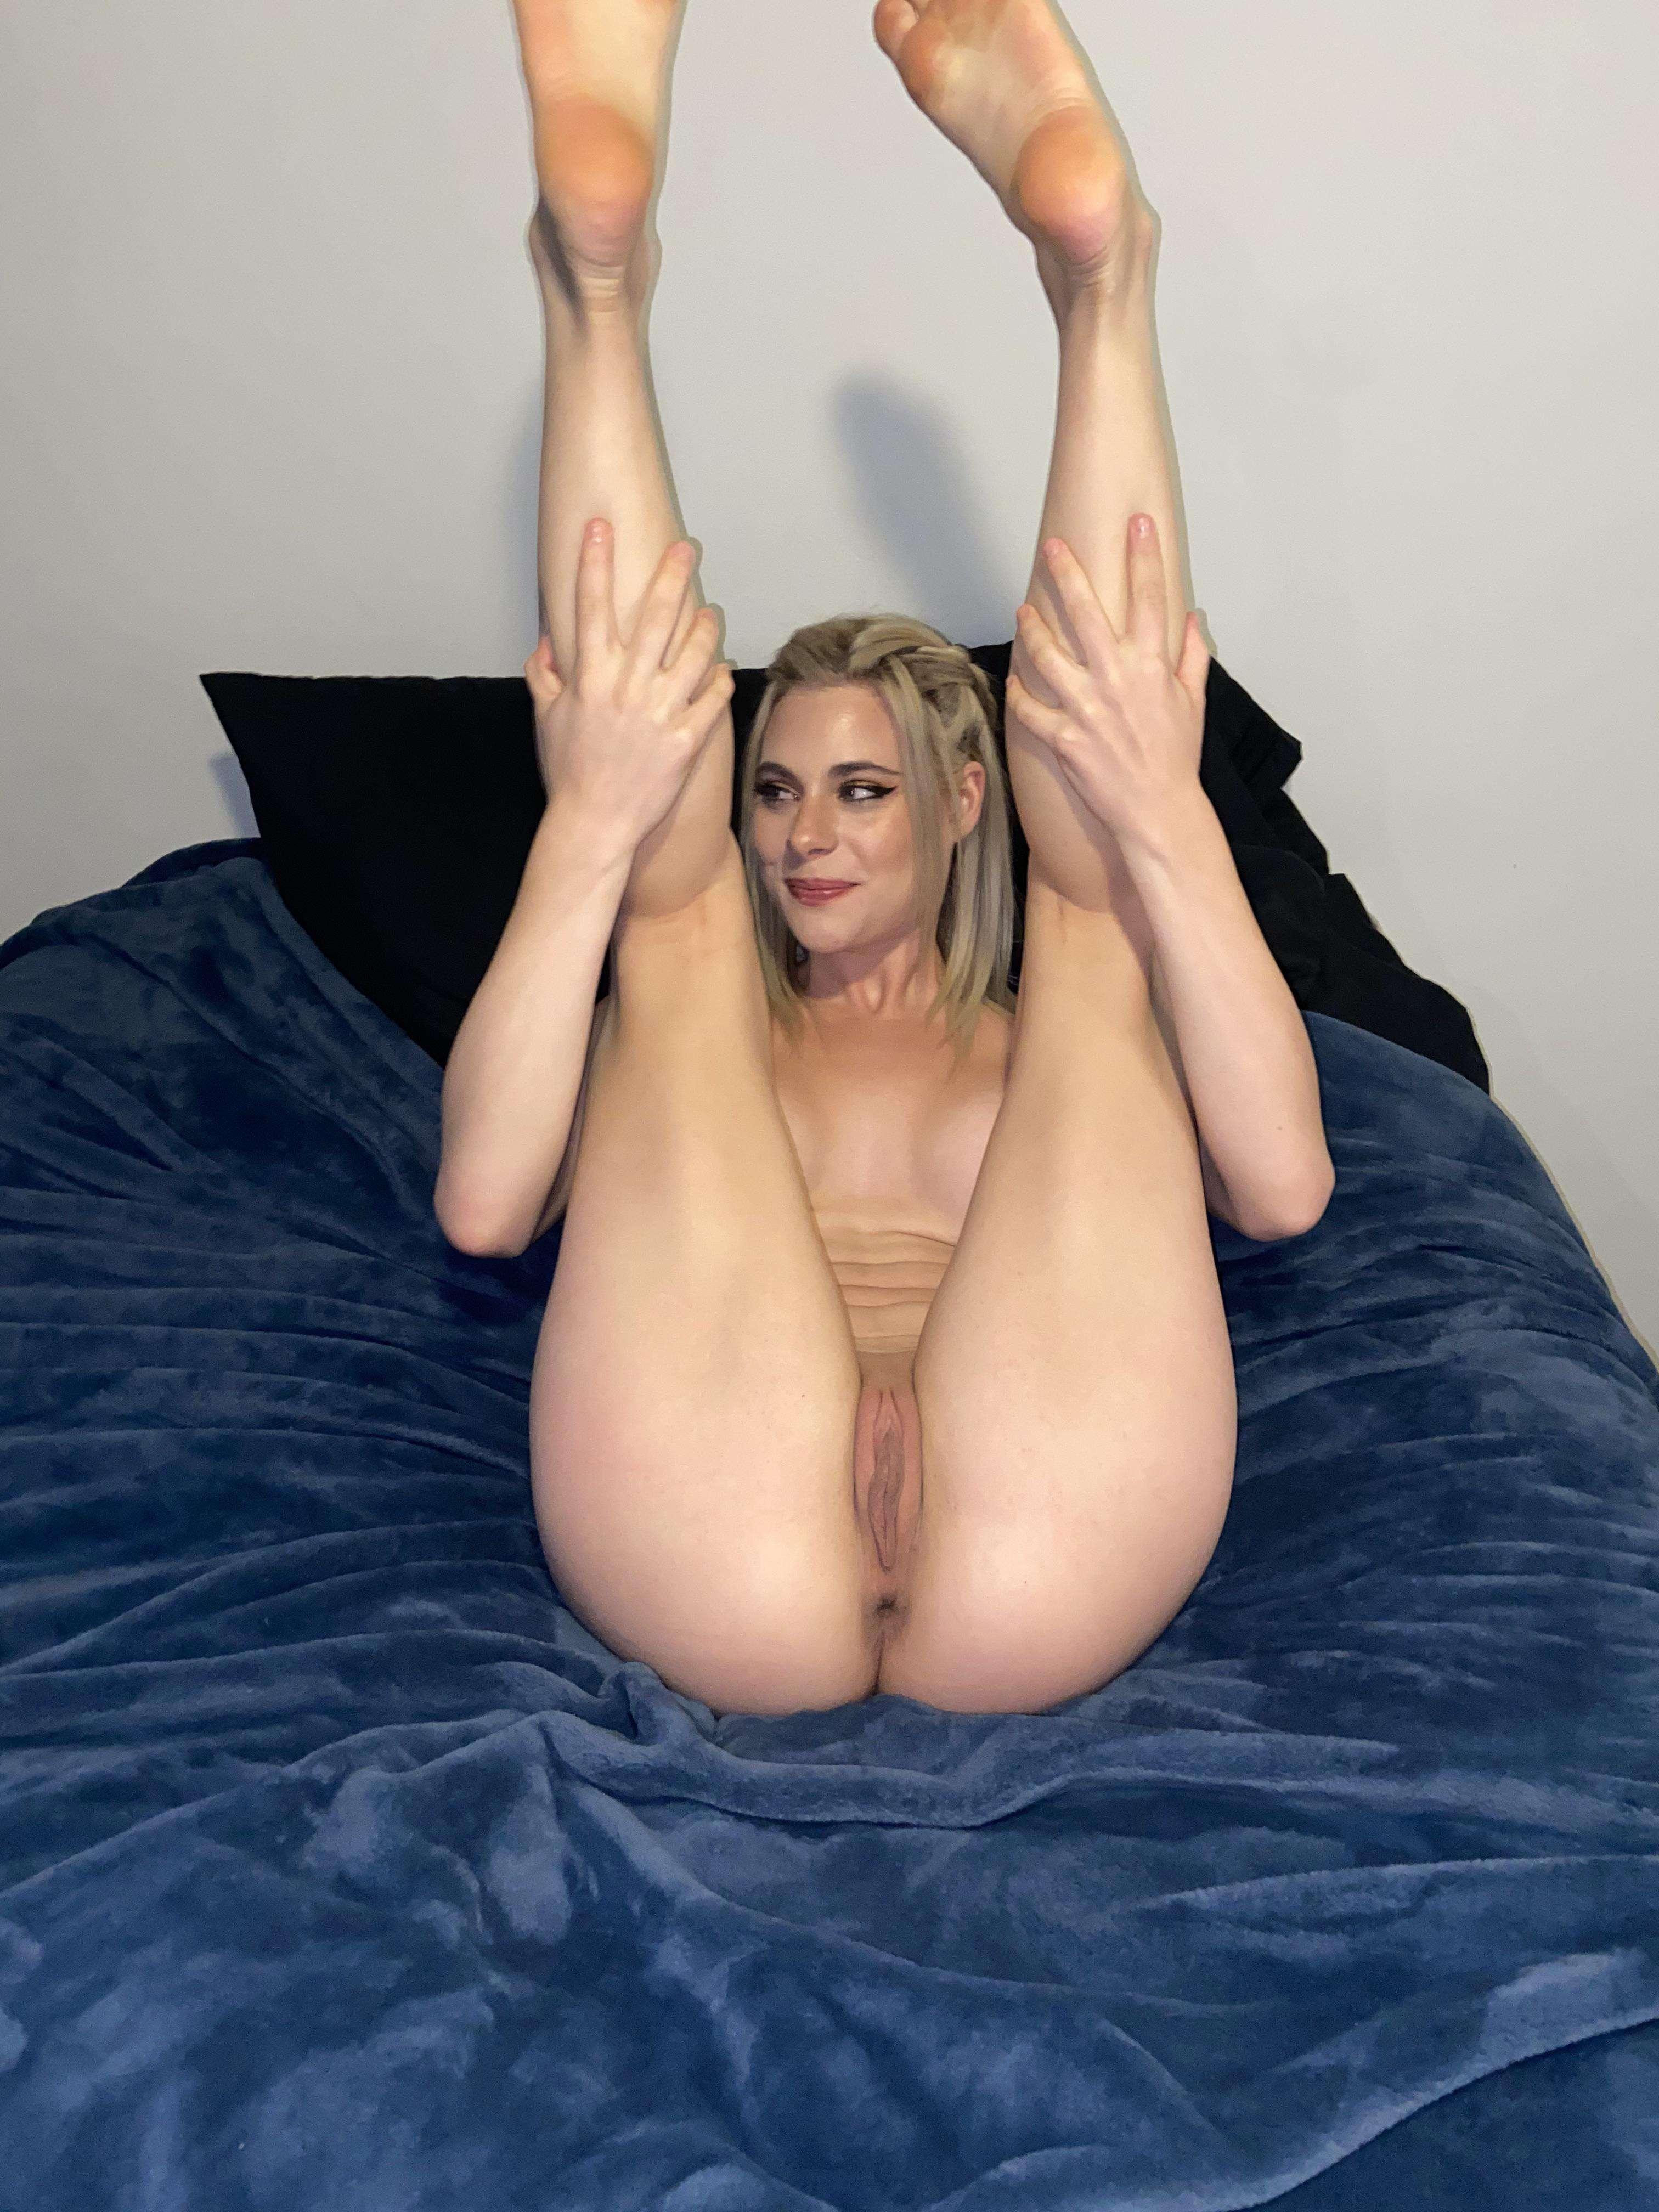 https://fitnakedgirls.com/wp-content/uploads/2020/10/FitNakedGirls.com-Livi-Mawie-nude-19.jpg